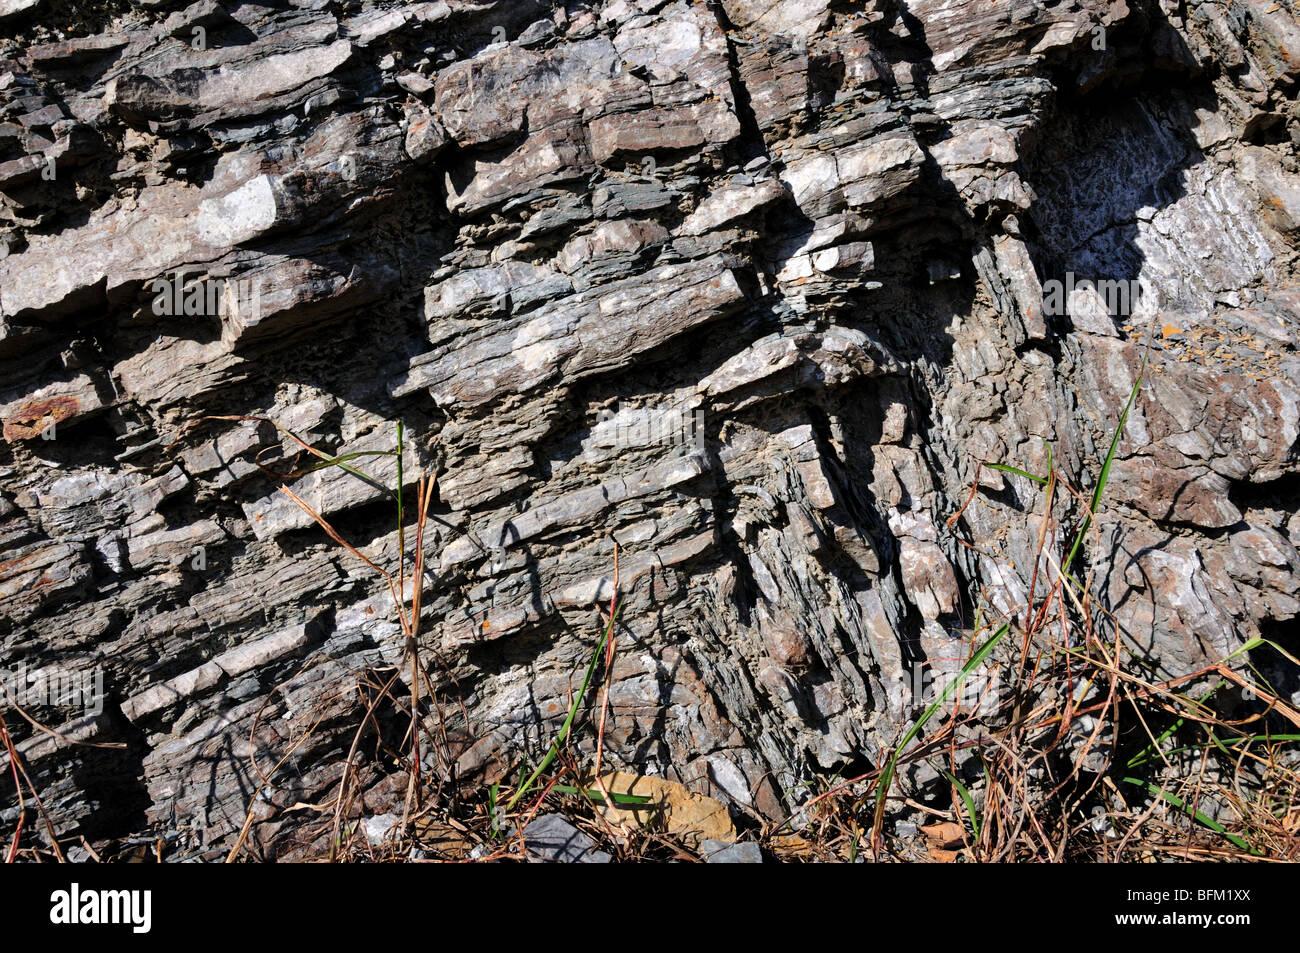 Folds in limestone, Oklahoma, USA. - Stock Image